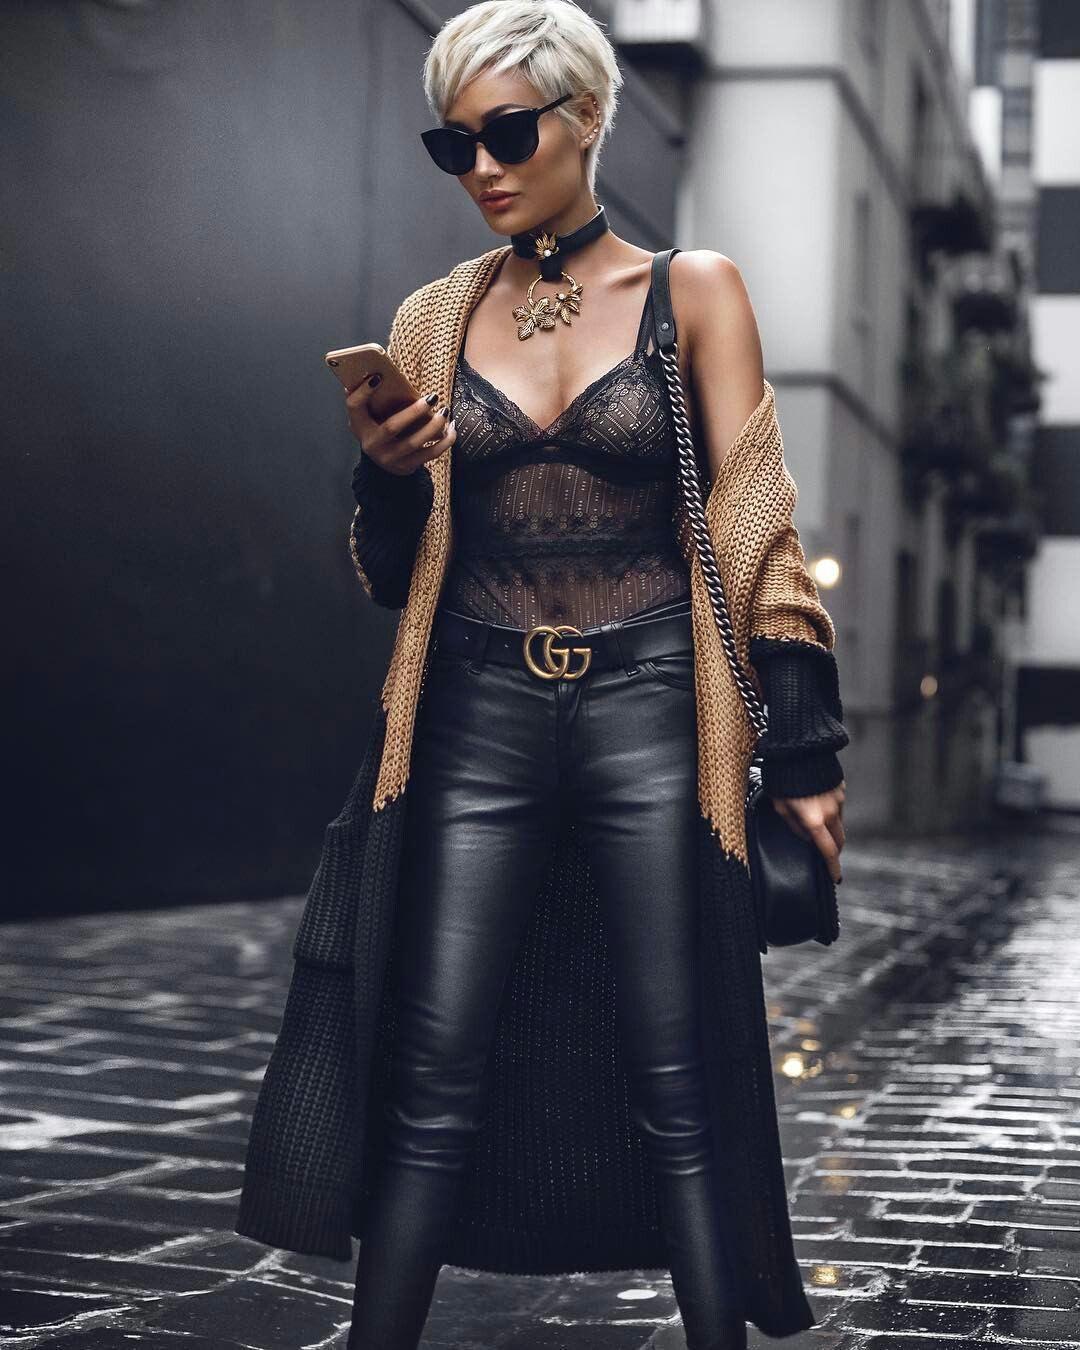 Fashion, Edgy Fashion, Women